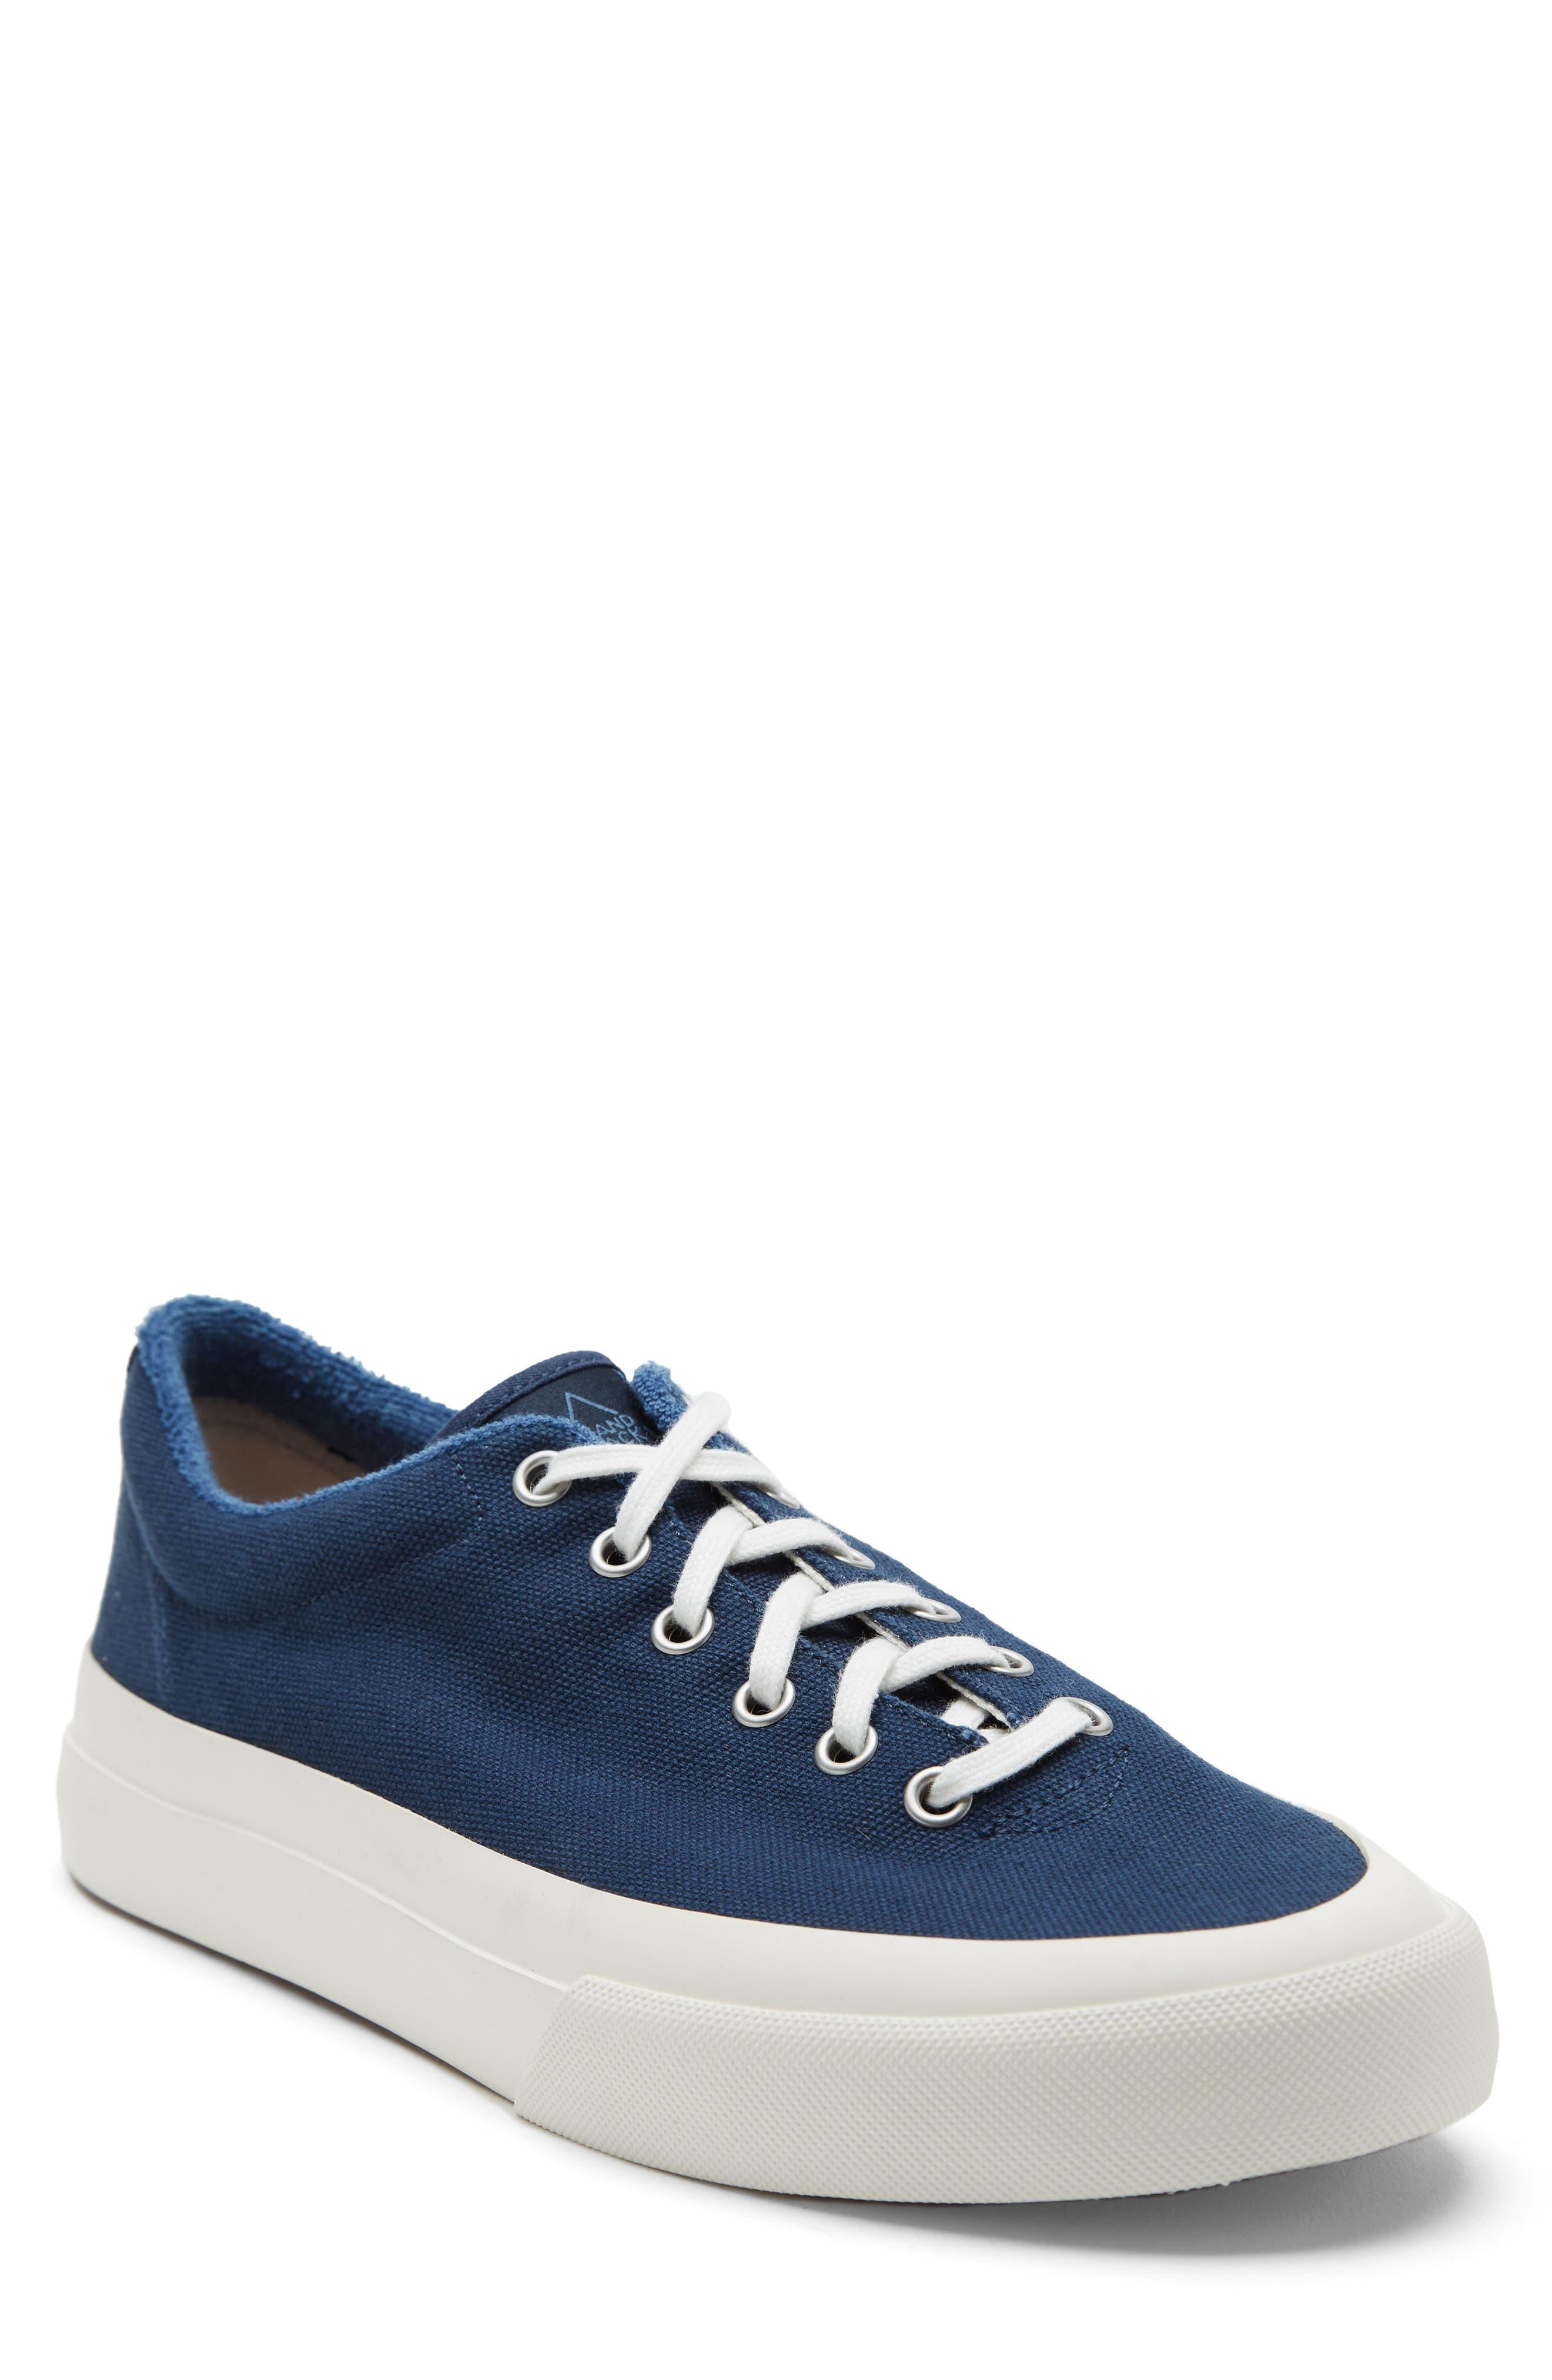 Vesta Low Top Sneaker,                         Main,                         color, Navy